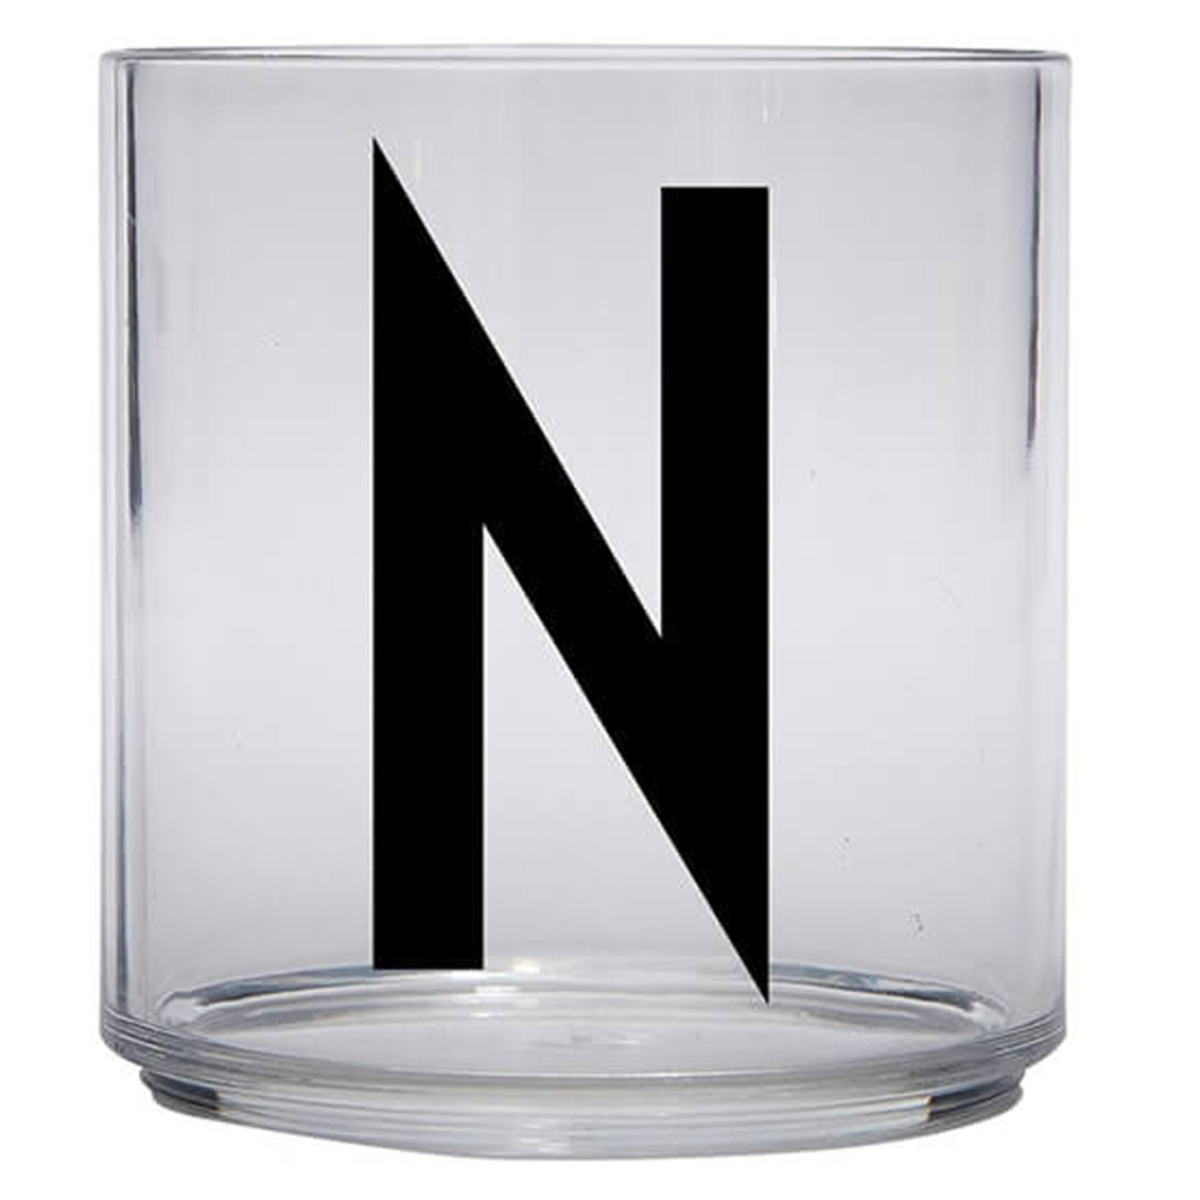 Tasse & Verre Verre Transparent N - 220 ml Verre Transparent N - 220 ml